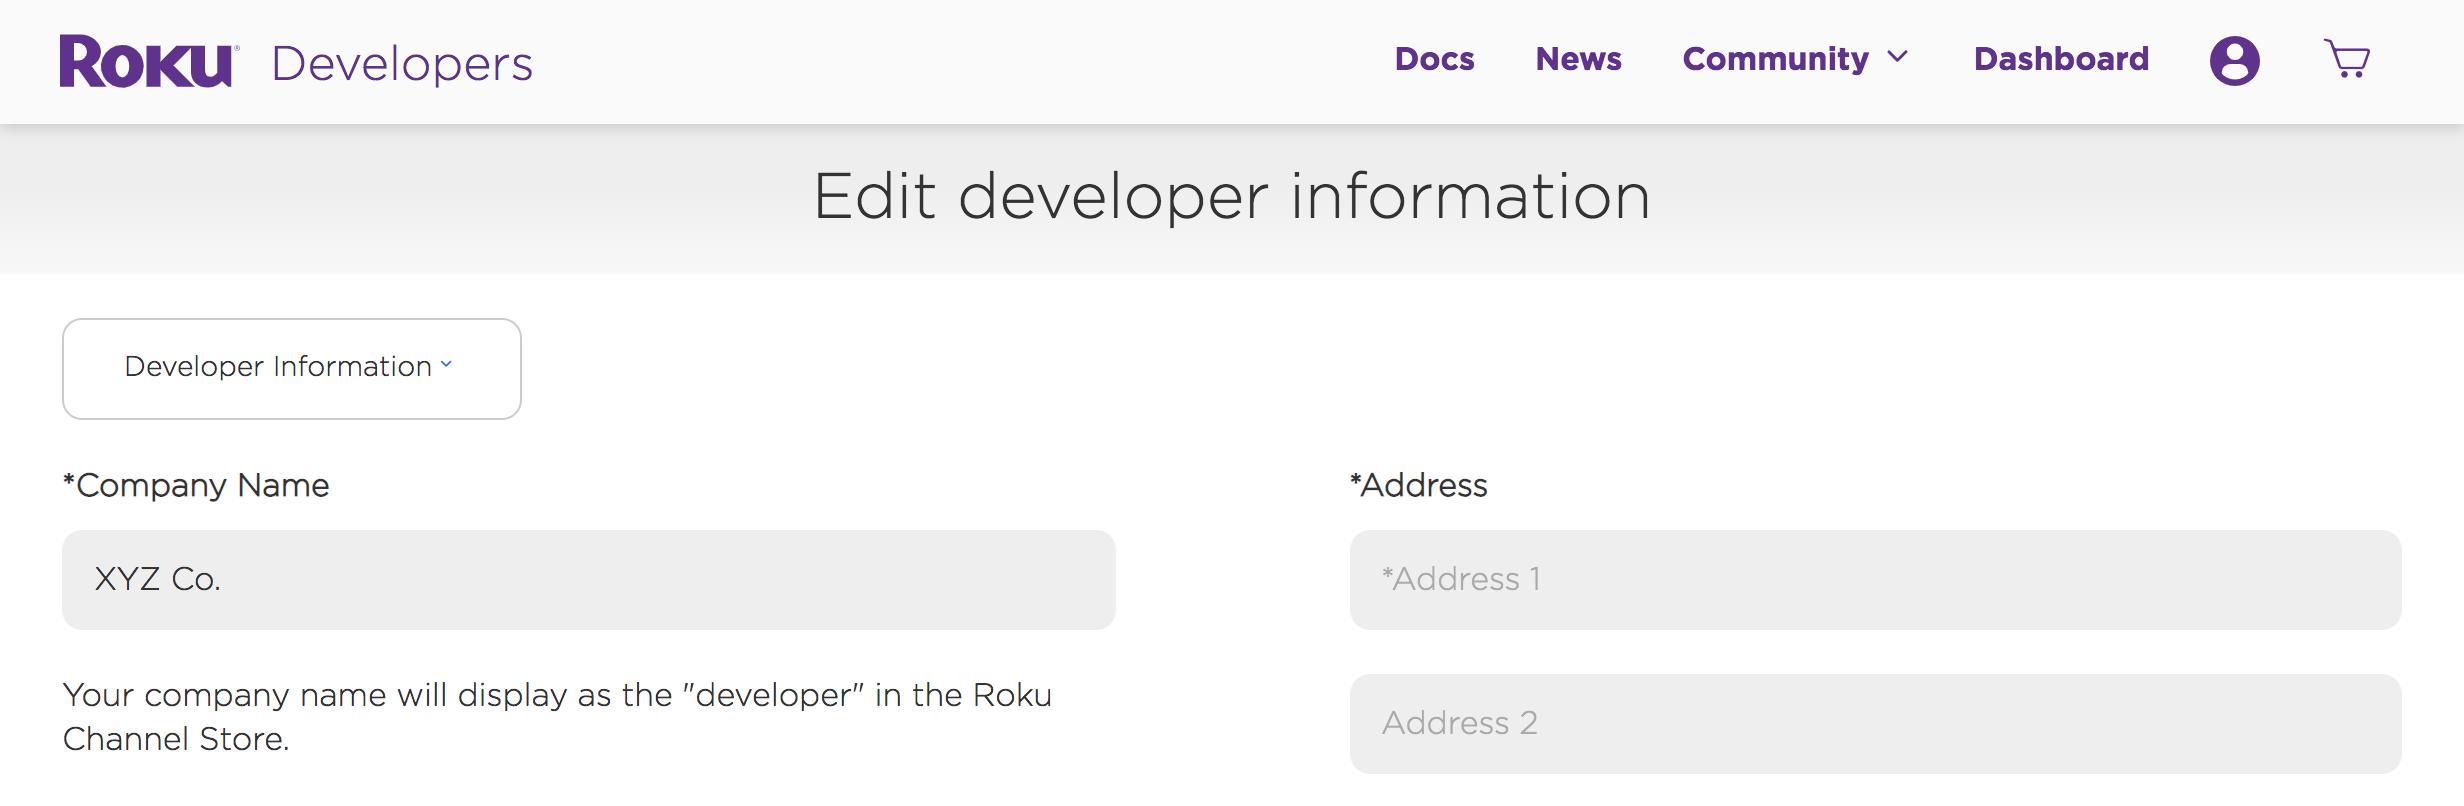 Roku SDK Documentation : Best practices for Roku Pay